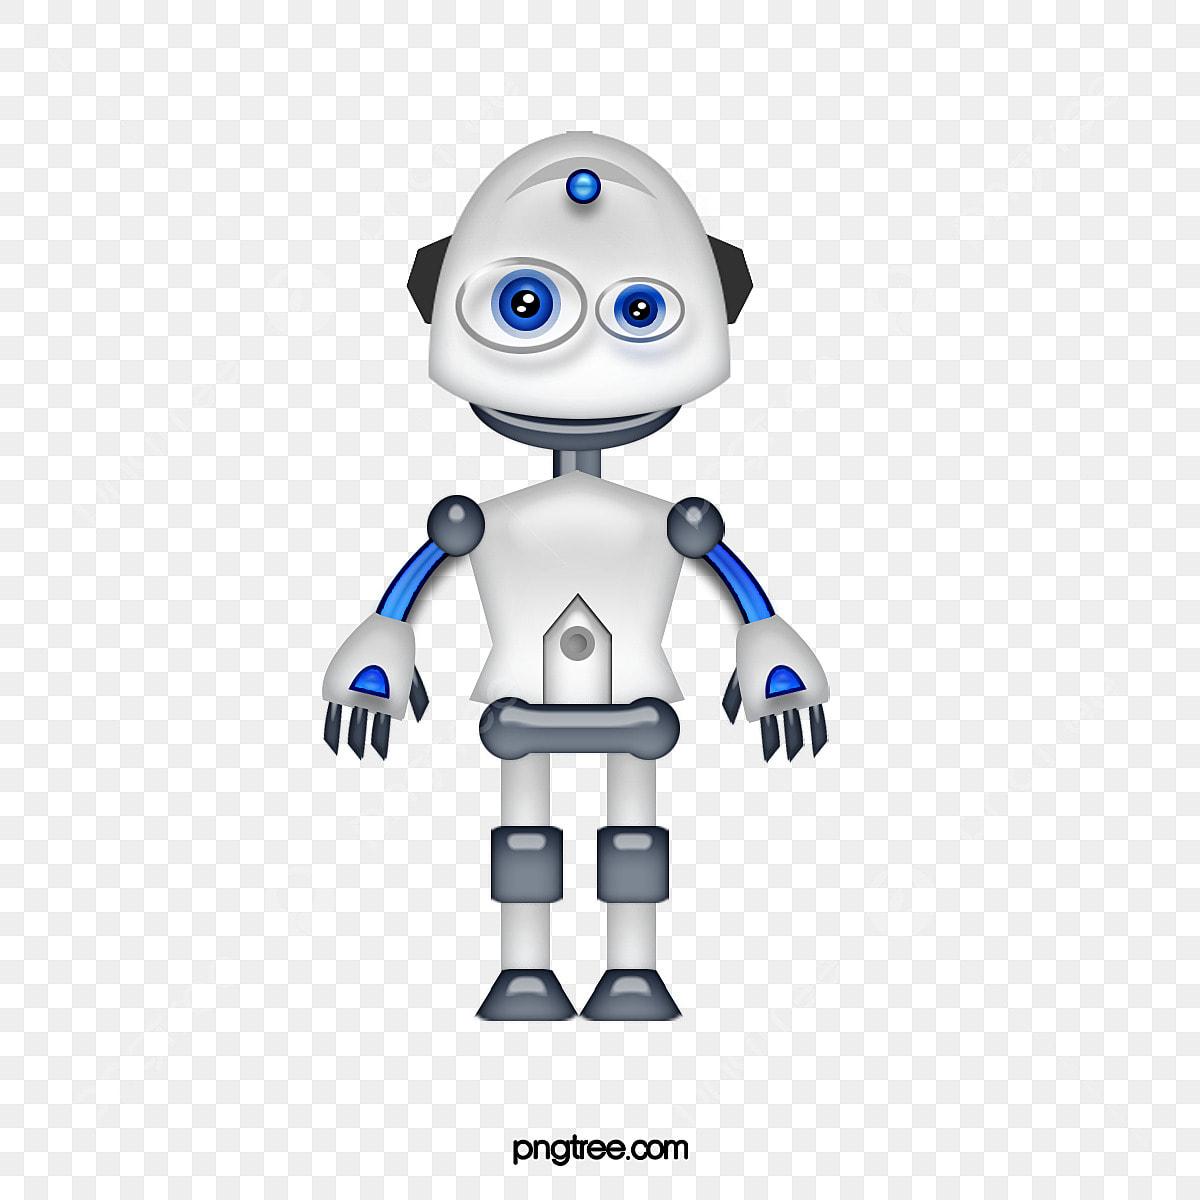 Moda Cute Cartoon Desenho De Robo O Robo Dos Desenhos Animados